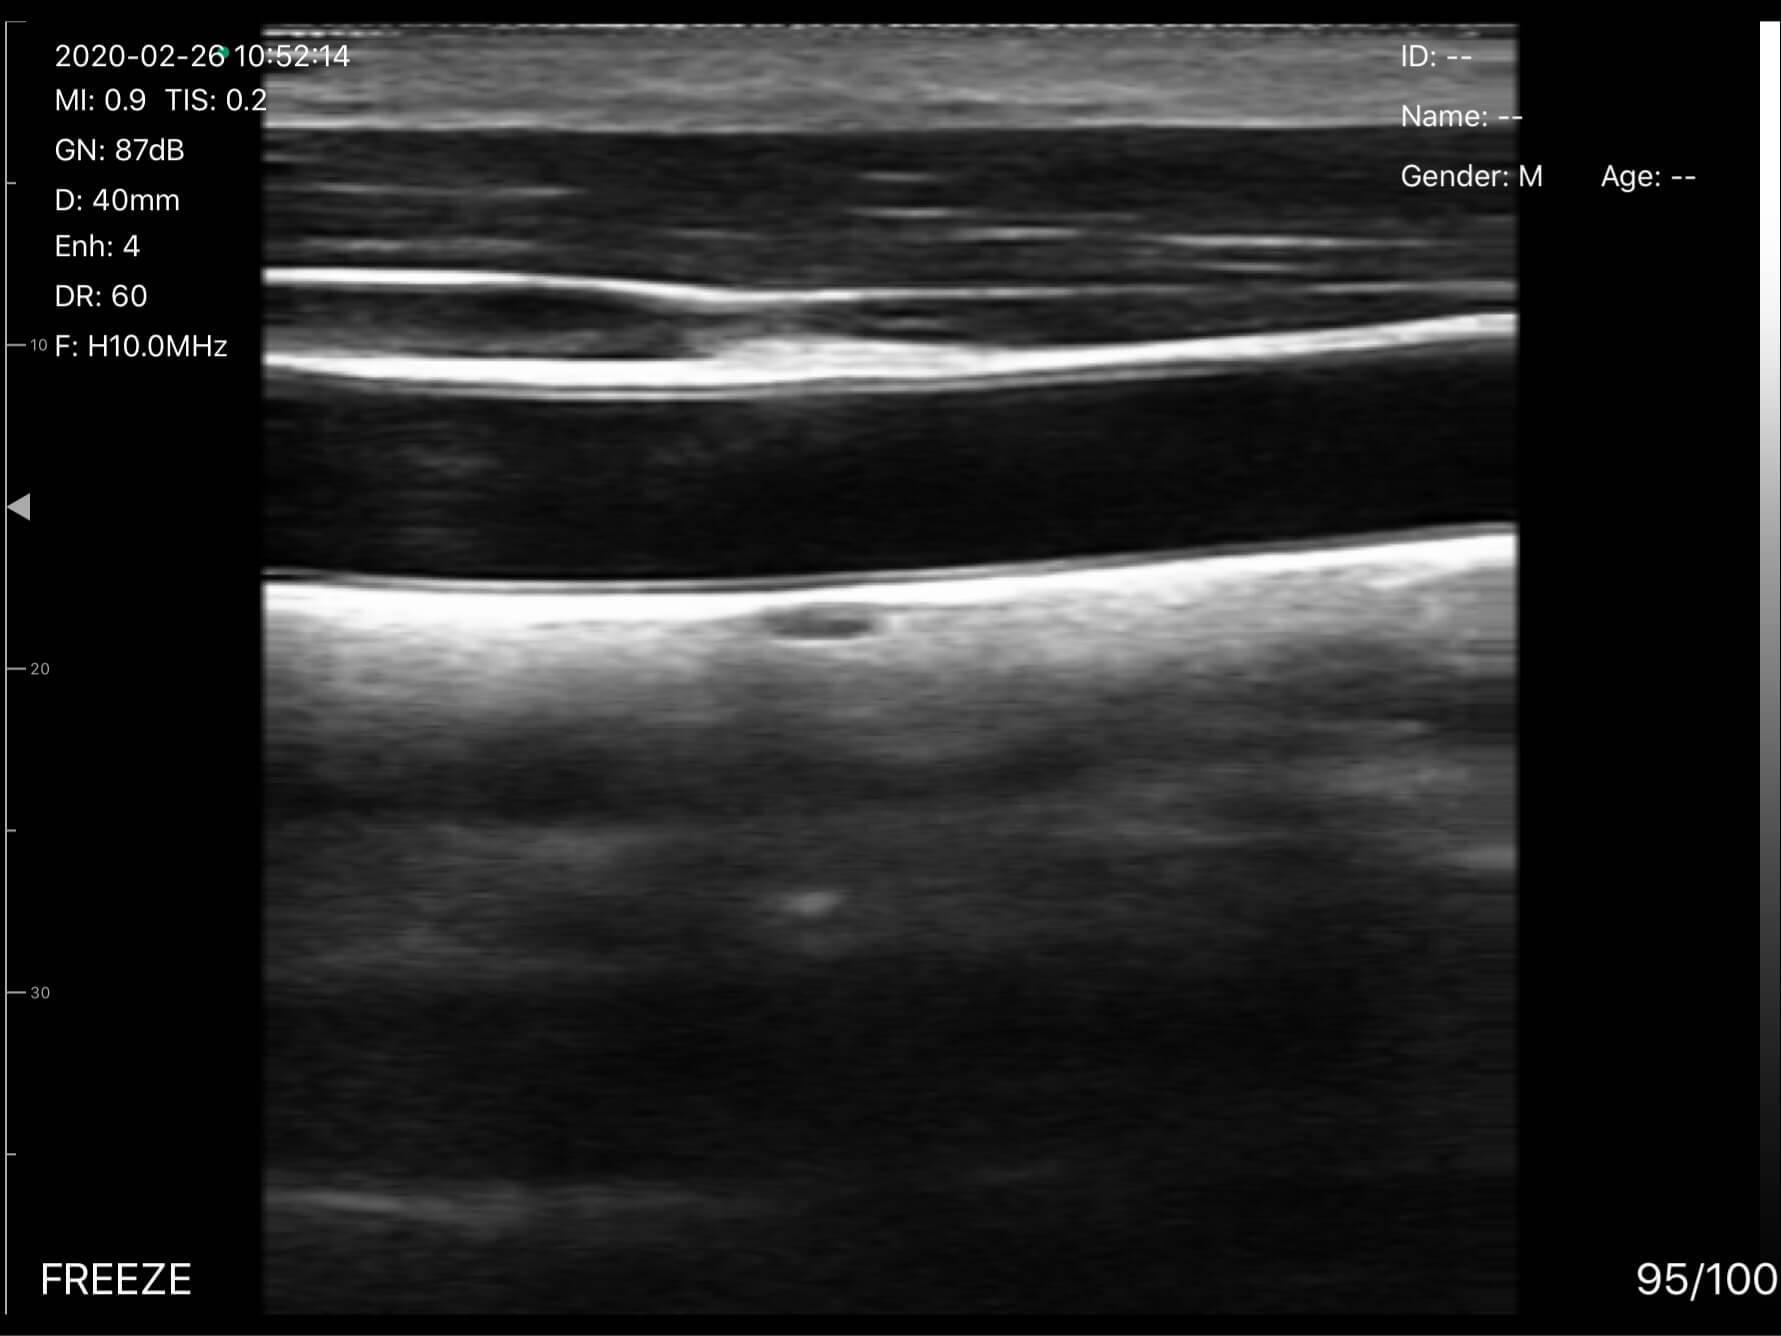 Ultrasound image of carotid & thyroid